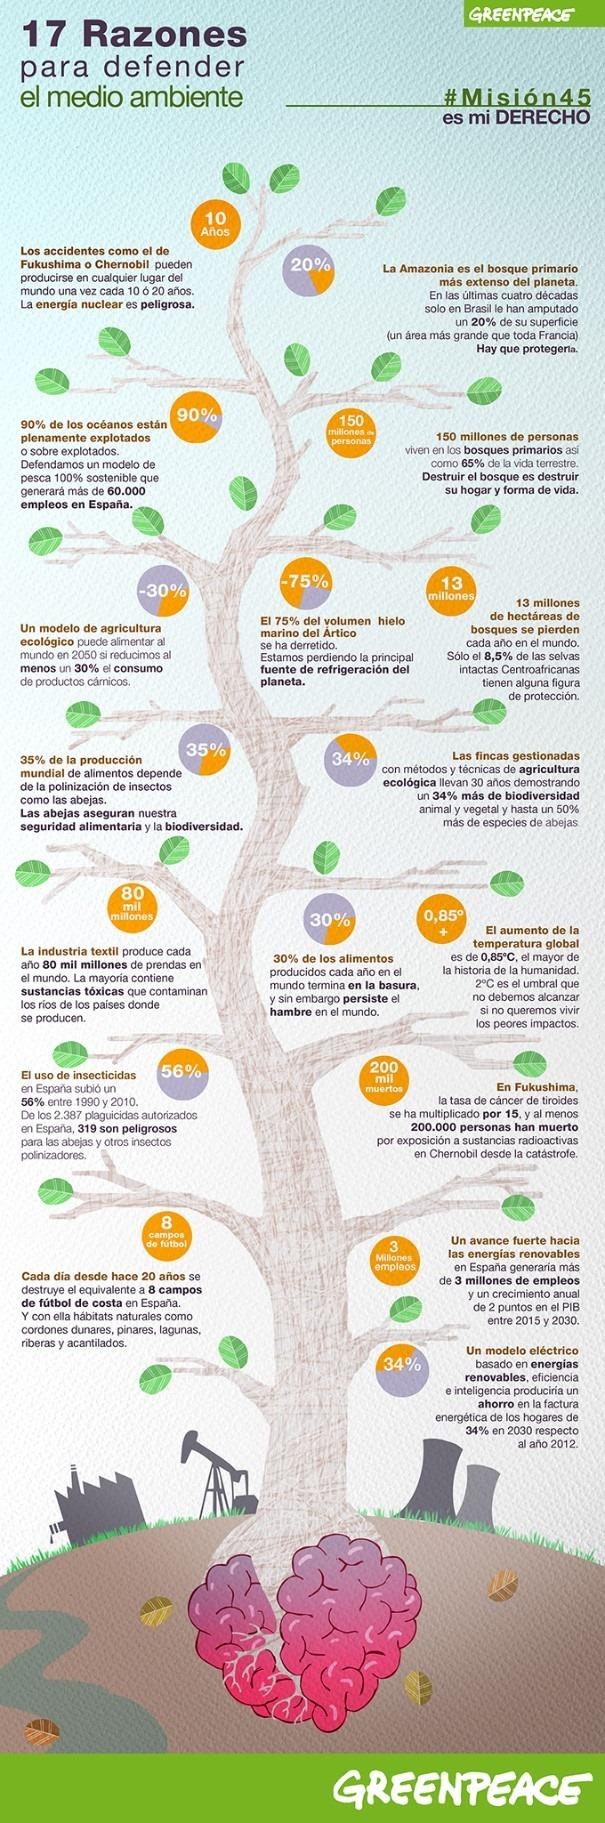 infografia-medio-ambiente-greenpeace